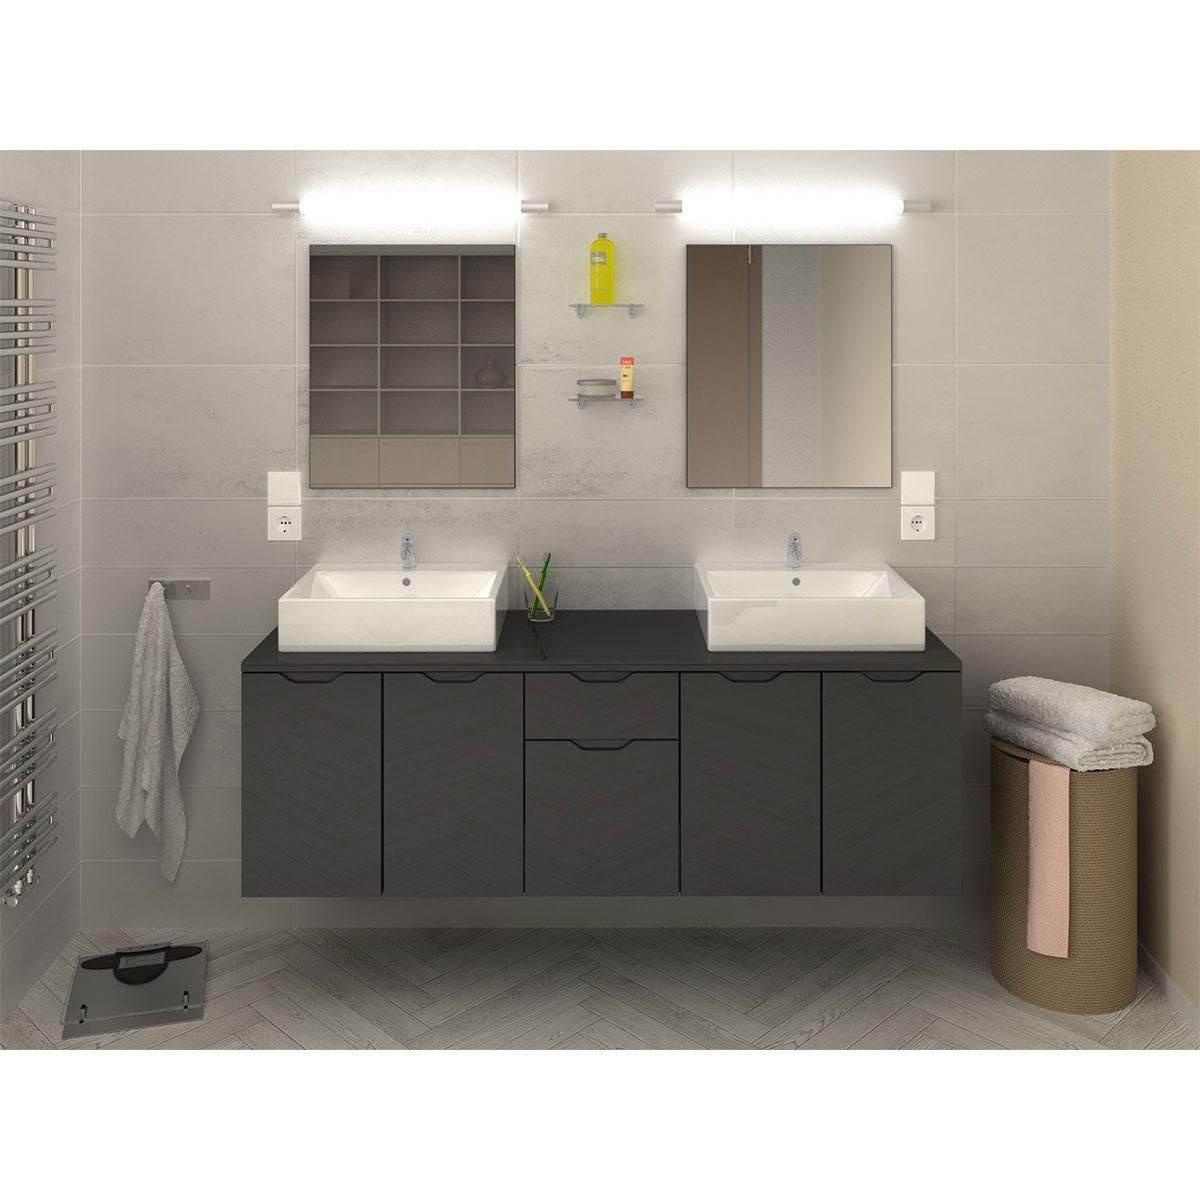 Ensemble design et moderne de salle de bain (Gris)